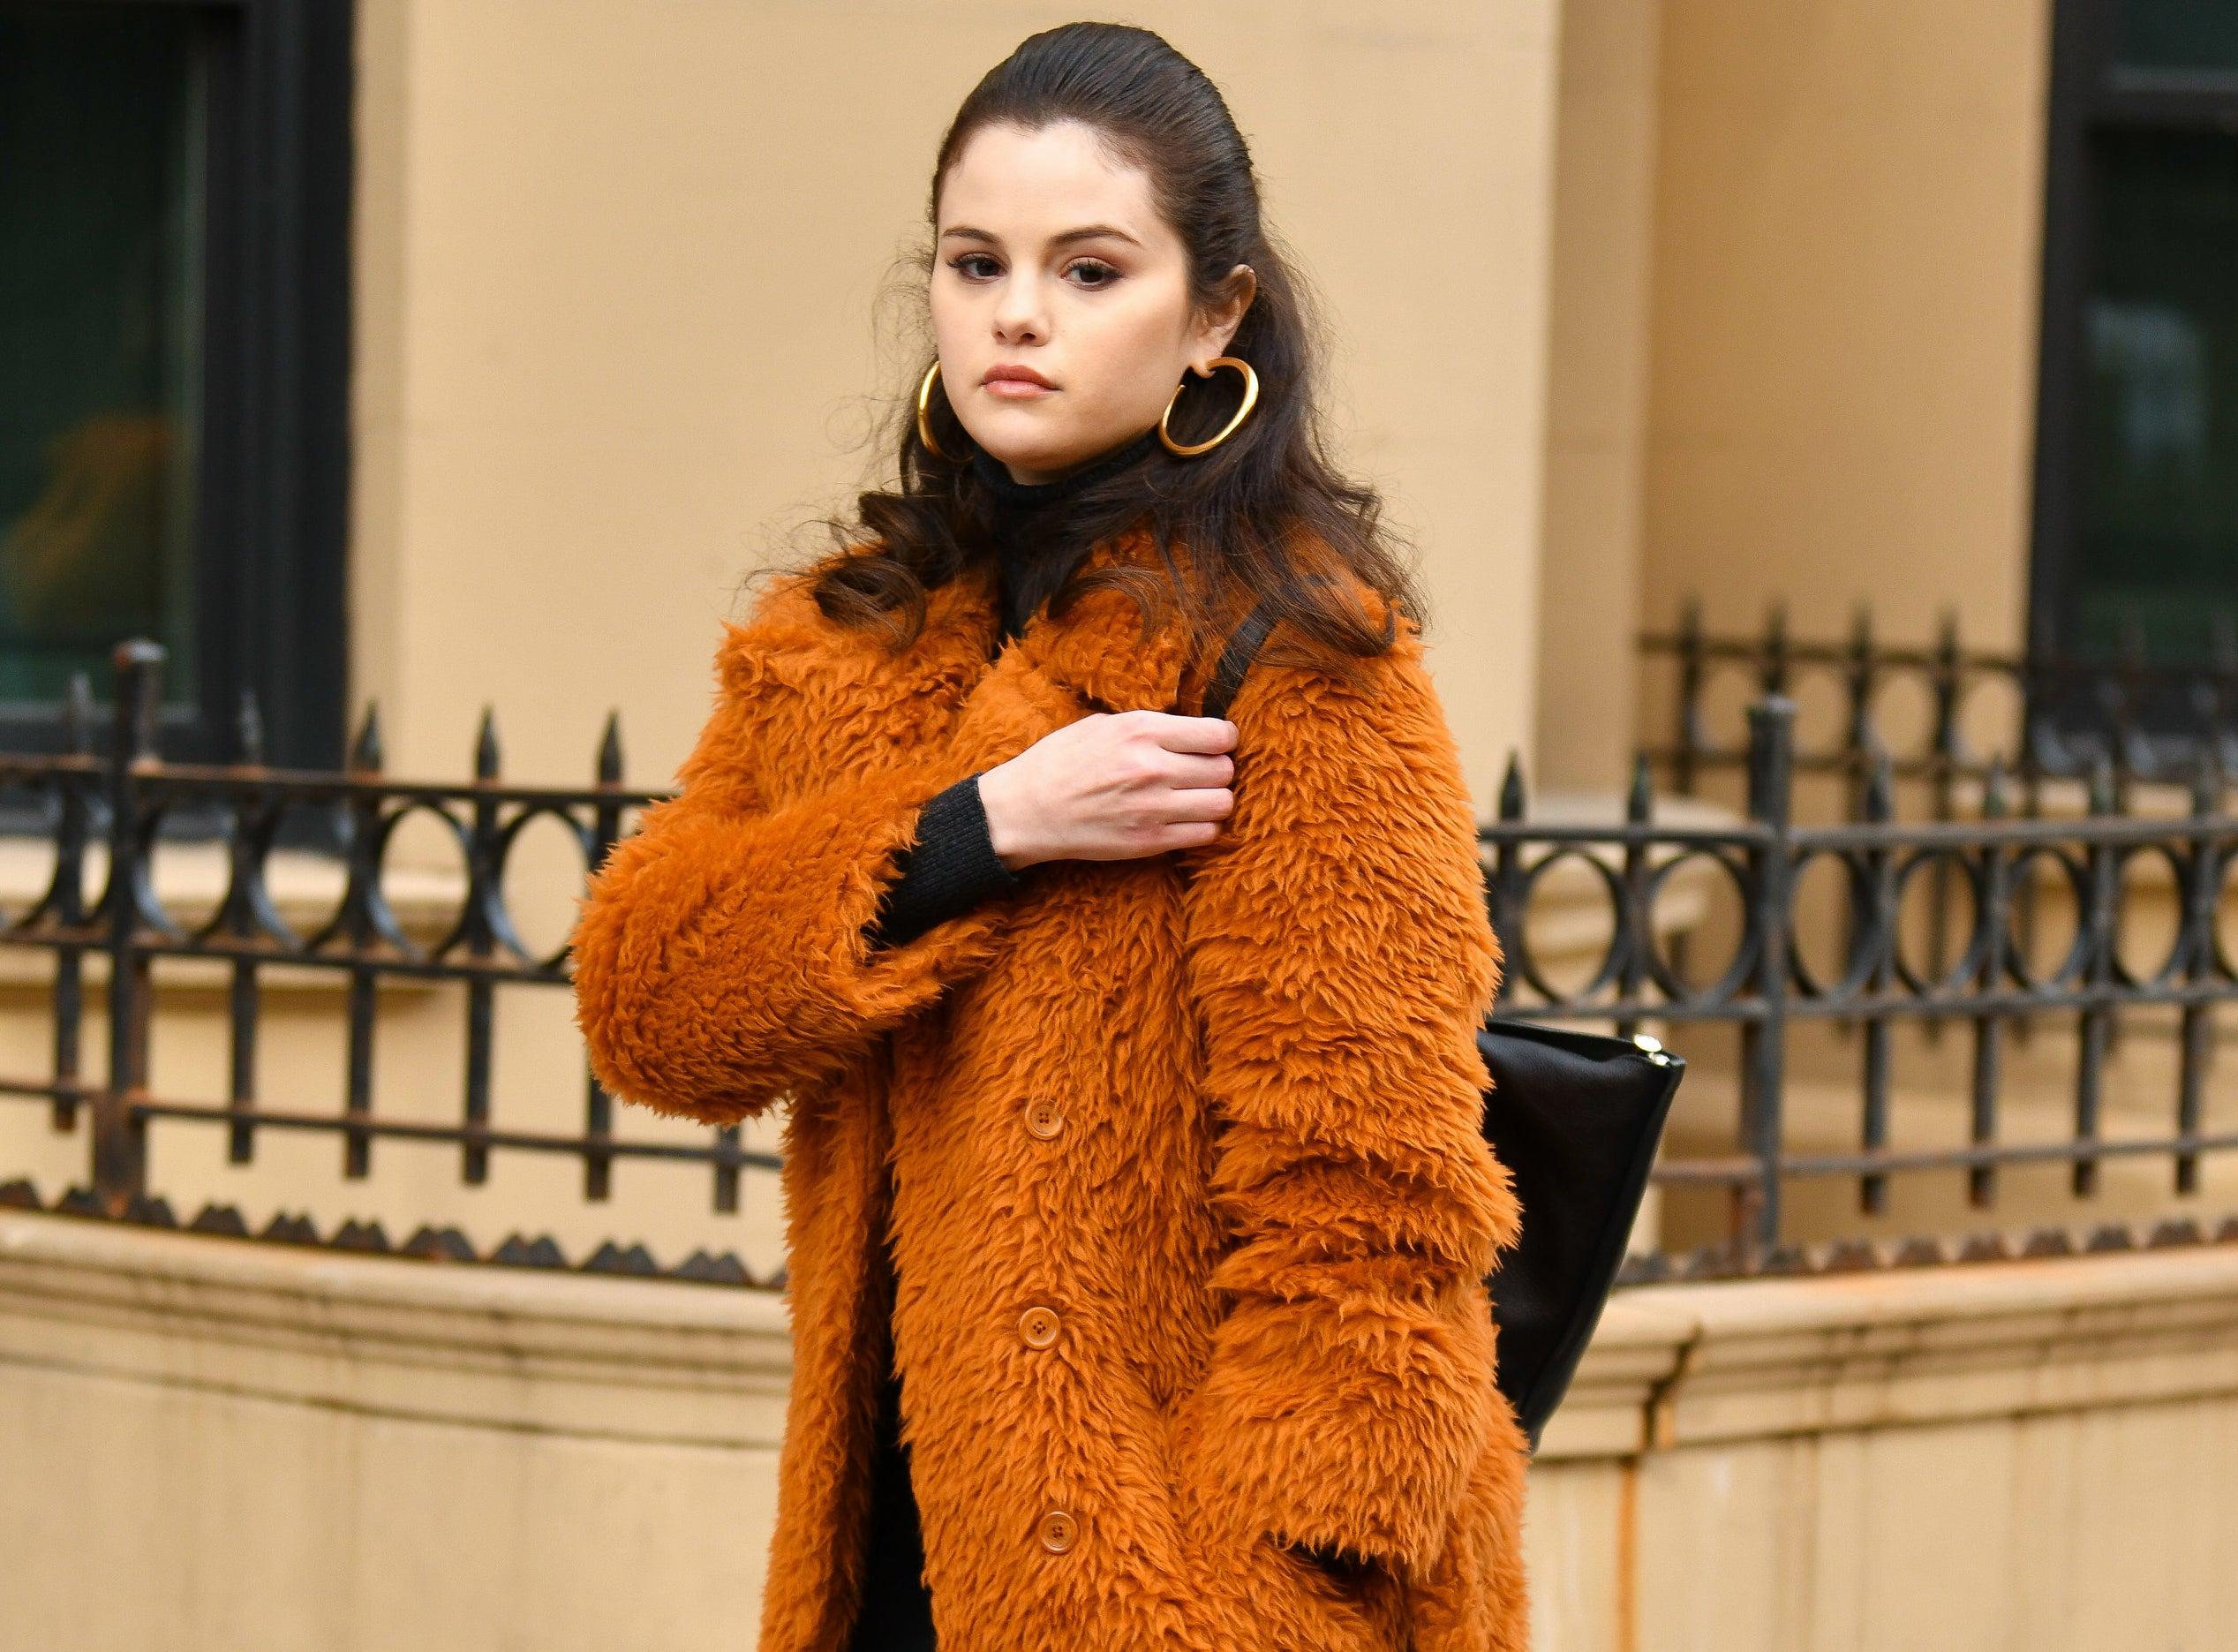 Selena looks glum while on set